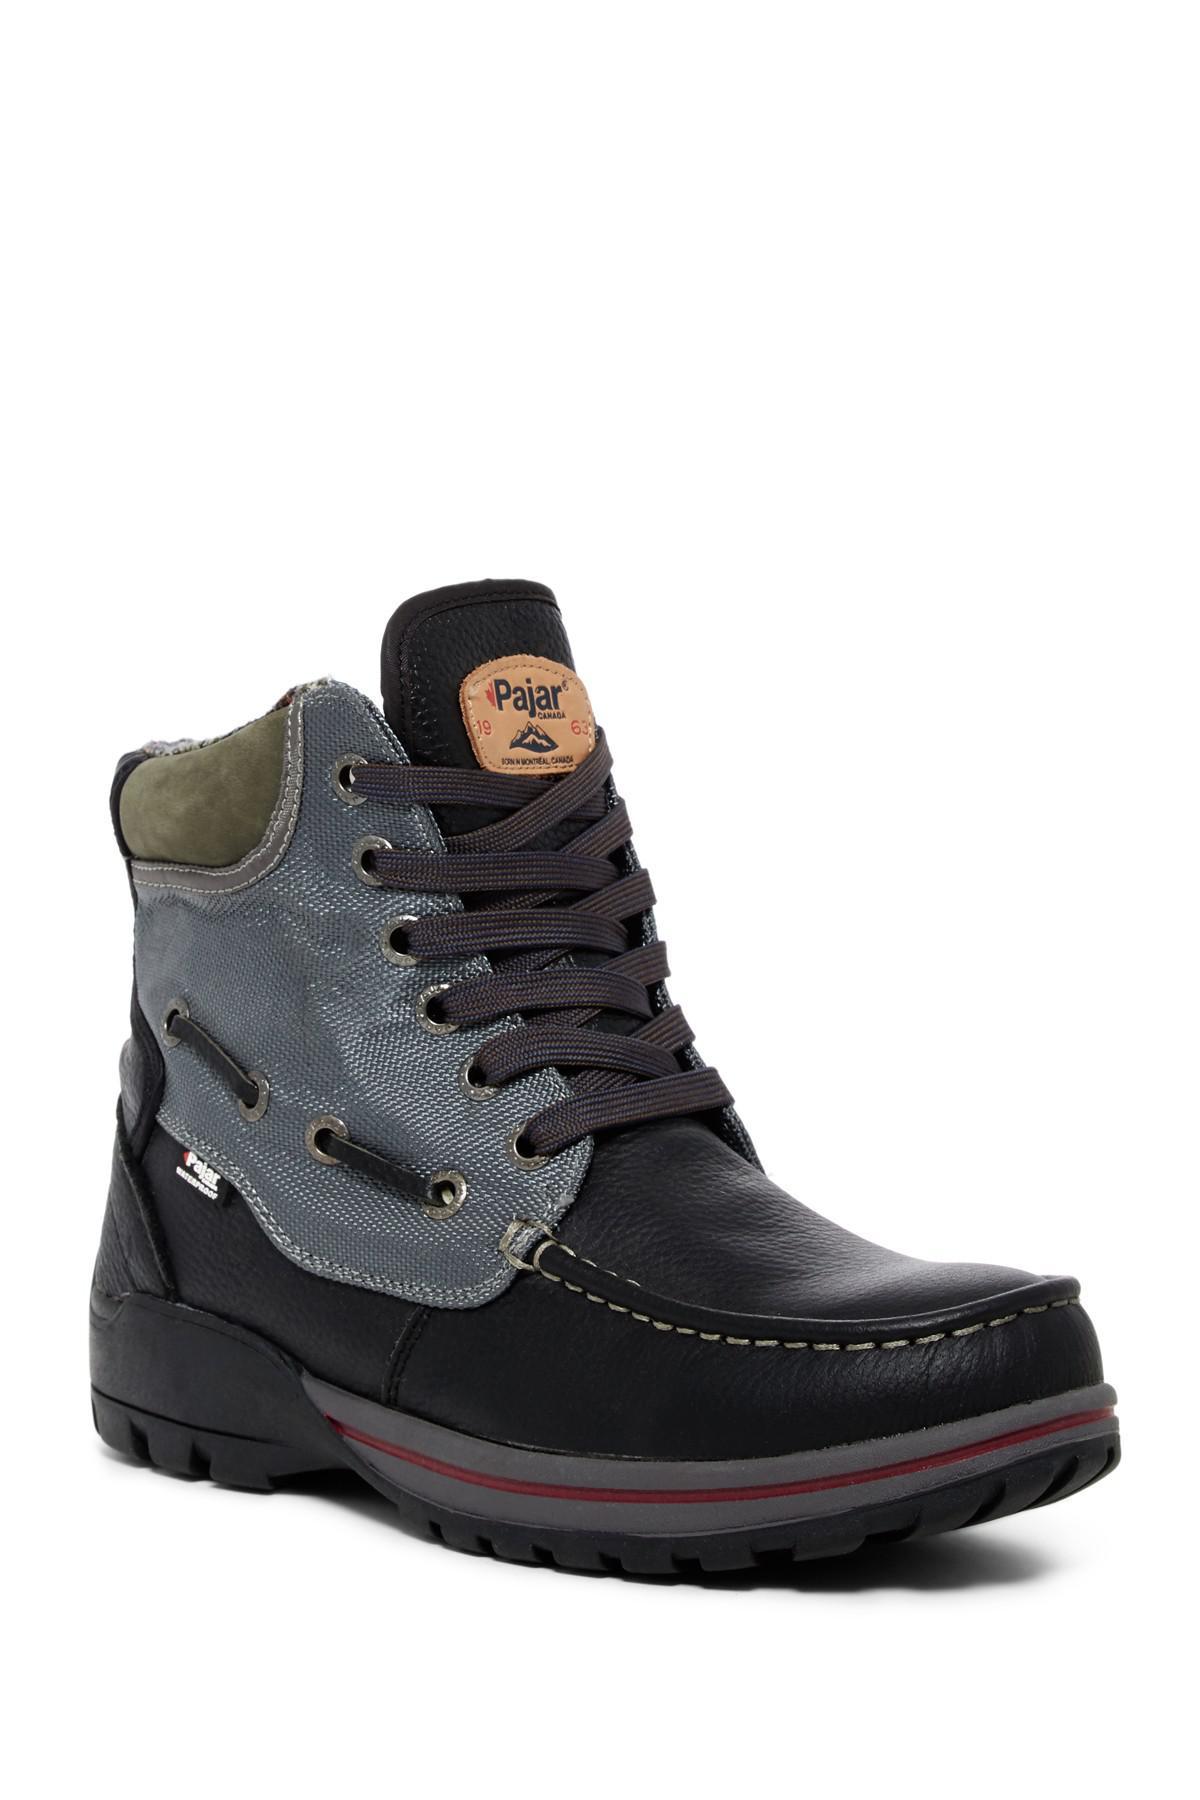 Pajar Leather Brent Waterproof Boot in